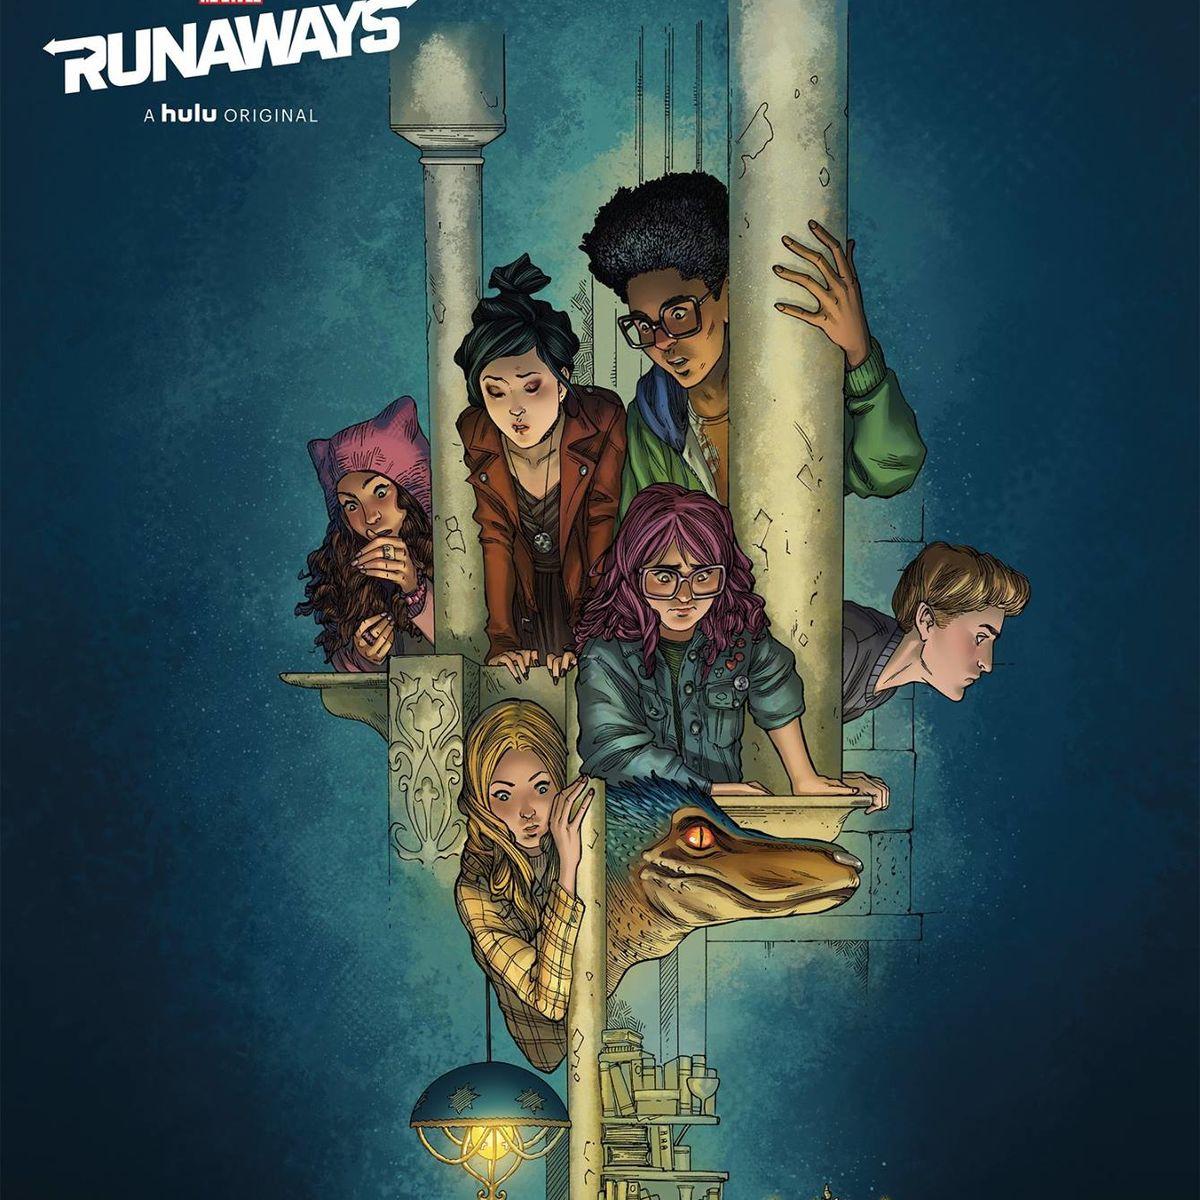 marvel-runaways-poster.jpg